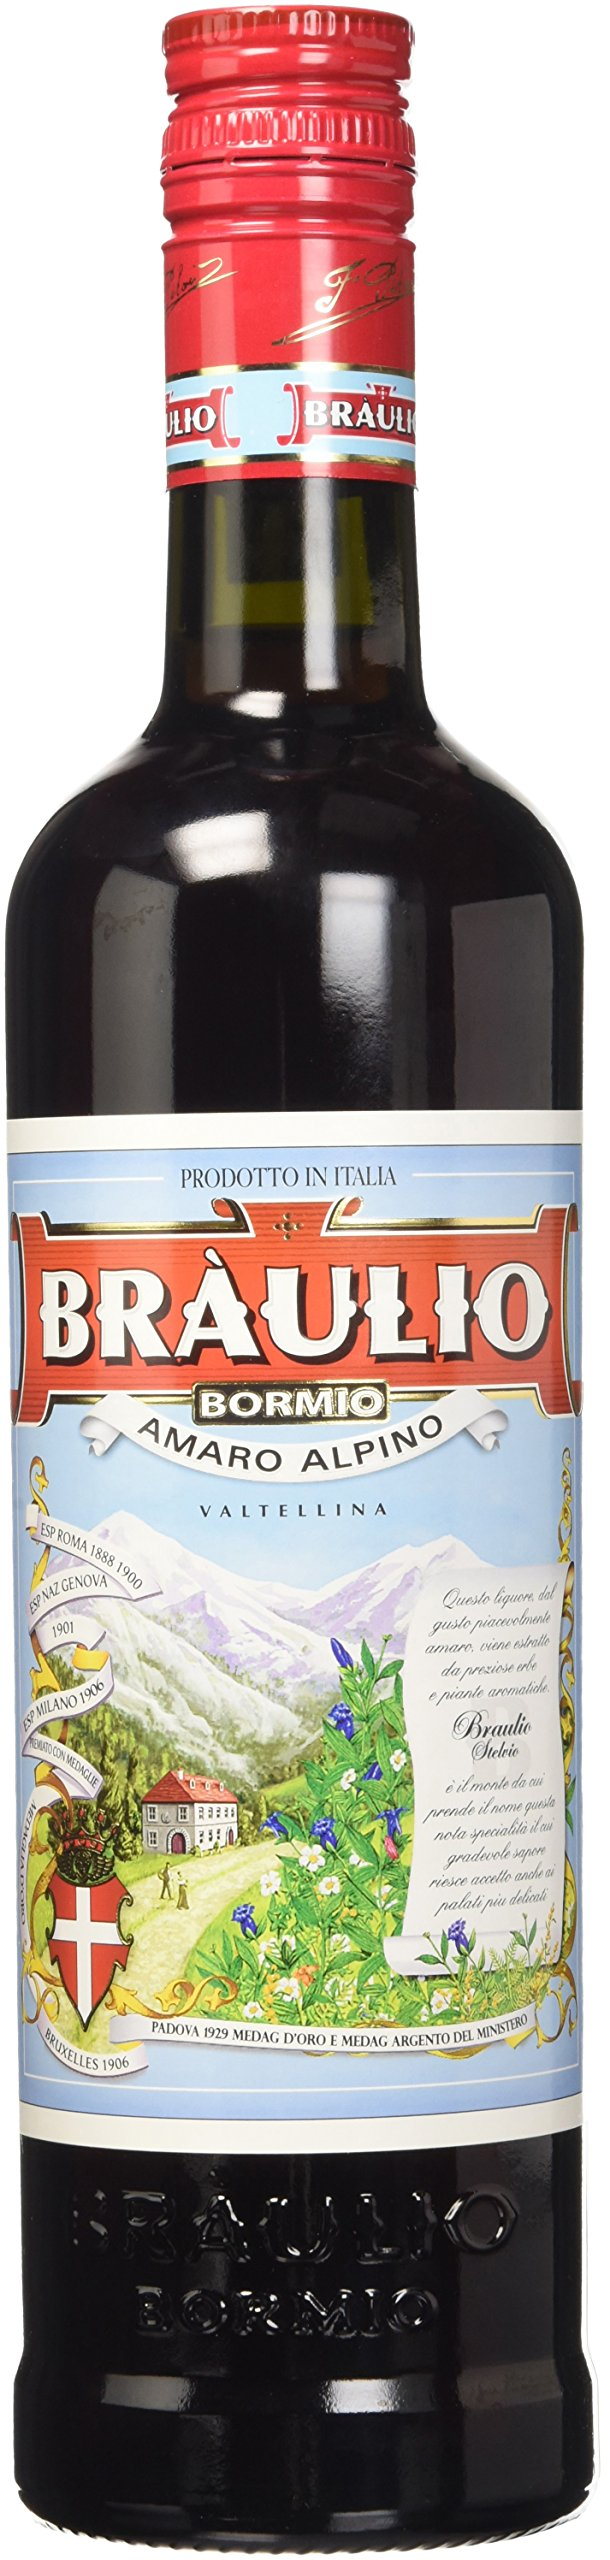 Braulio Amaro Ml.700